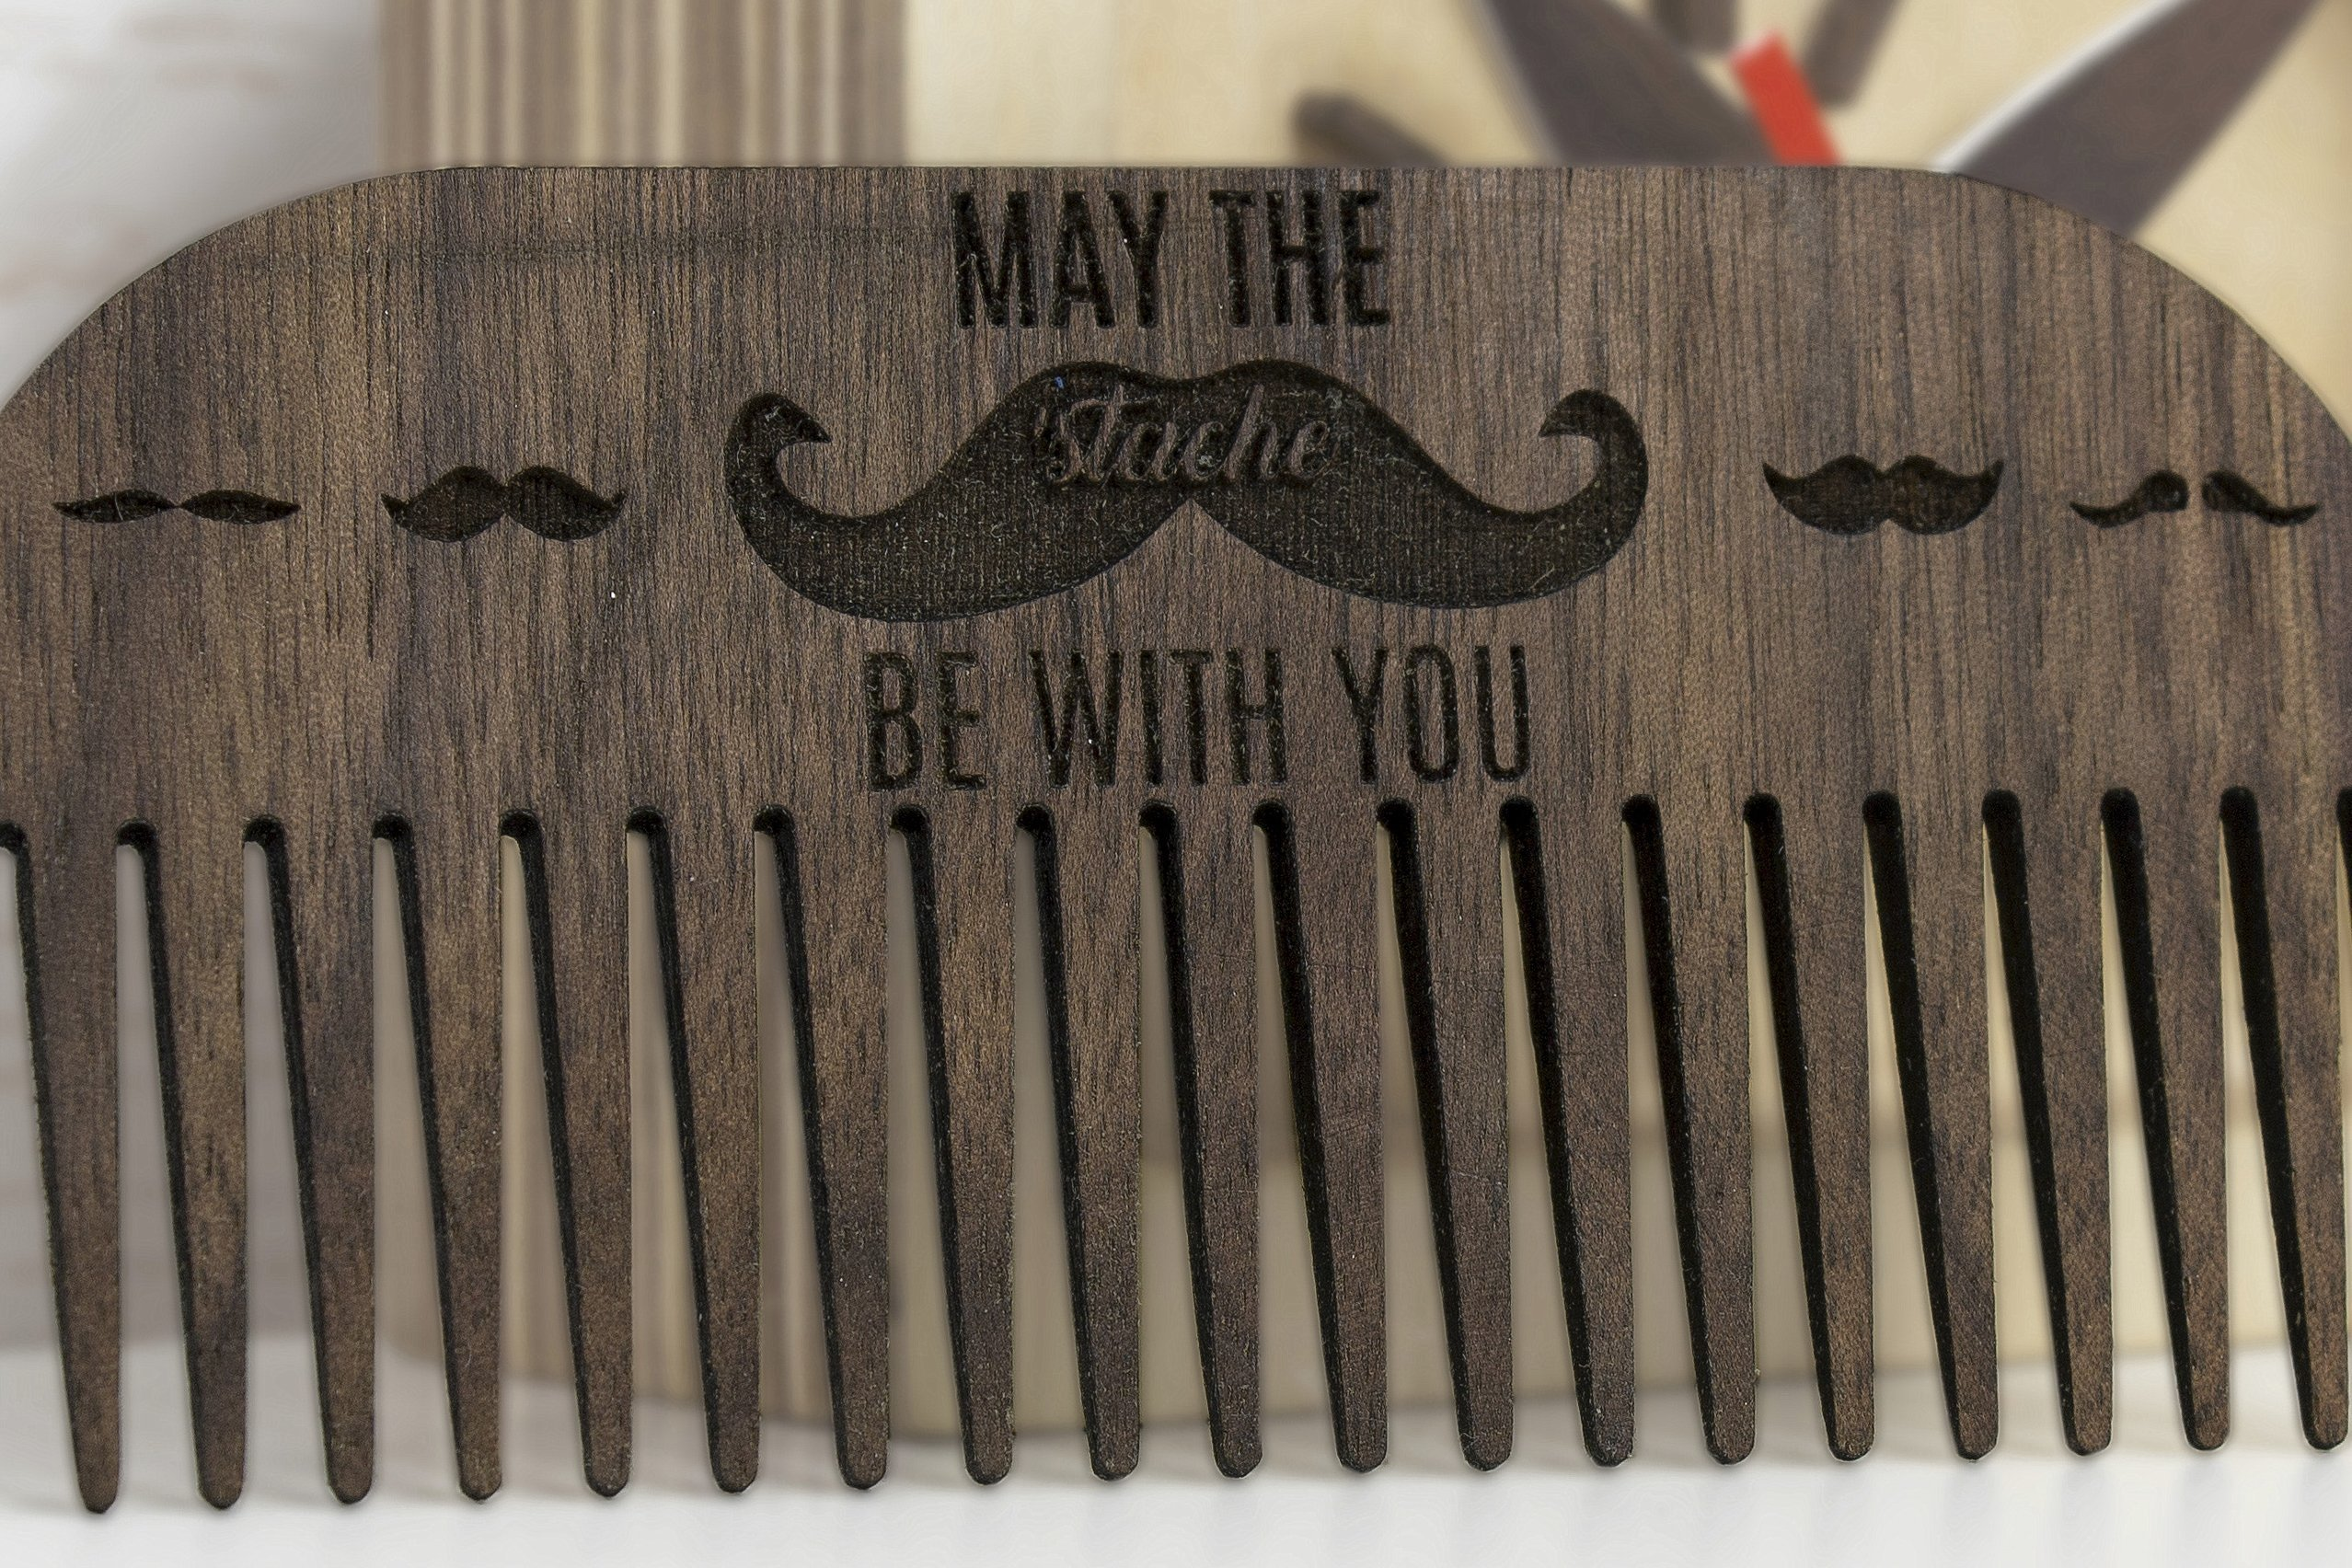 Walnut beard comb - Wooden beard comb - Walnut wood comb - Wooden comb - Wooden hairbrush - Brown comb - Father day gift - Husband gift